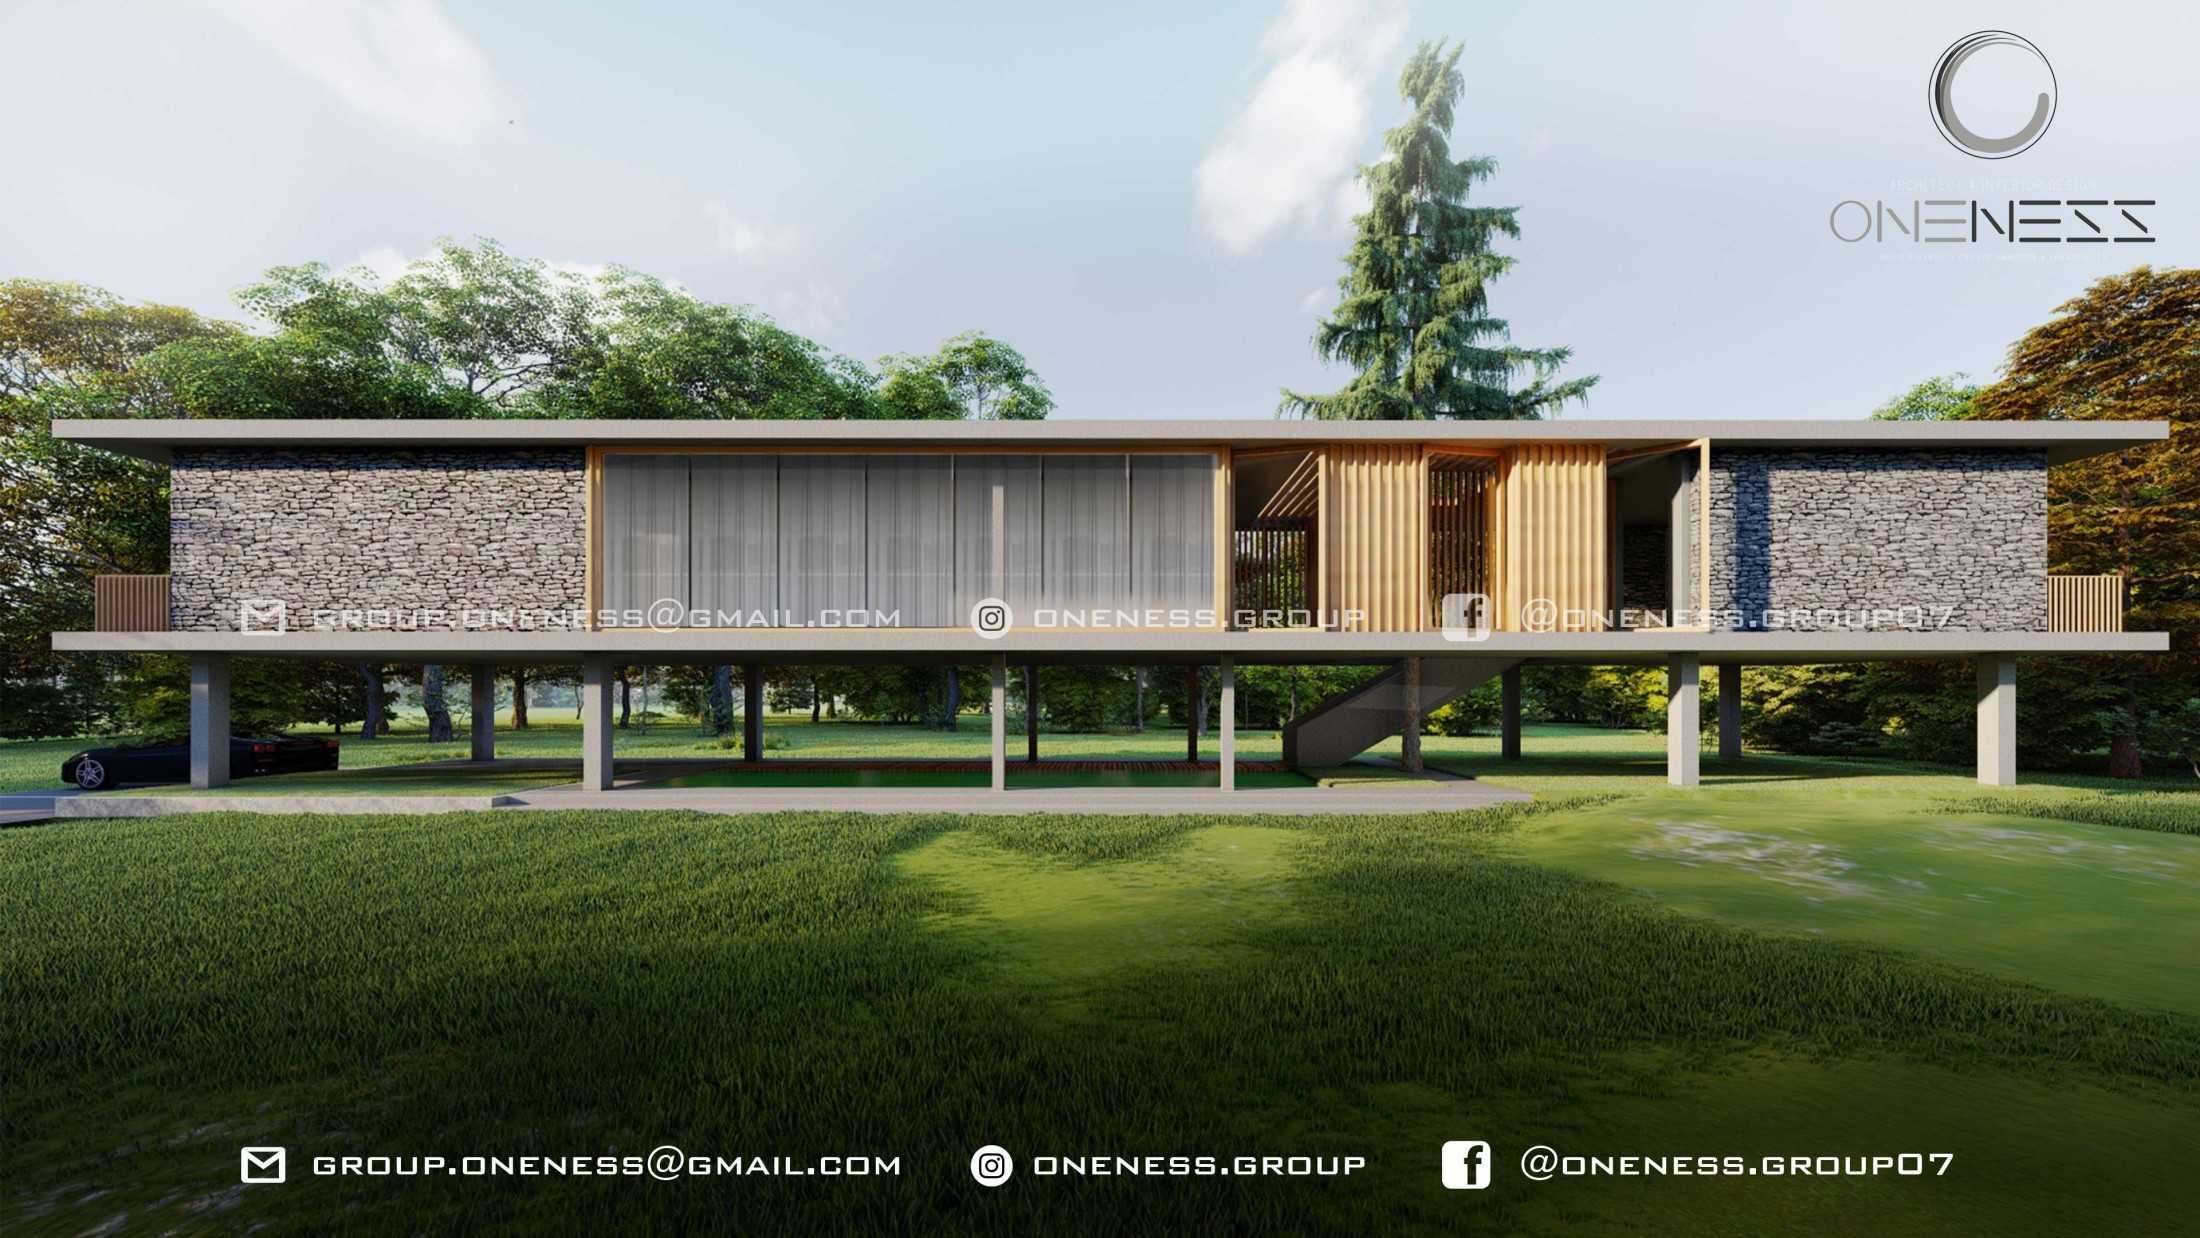 Oneness Group Villa Hijau Bali Bali, Indonesia Bali, Indonesia Eksterior Villa Hijau  98241